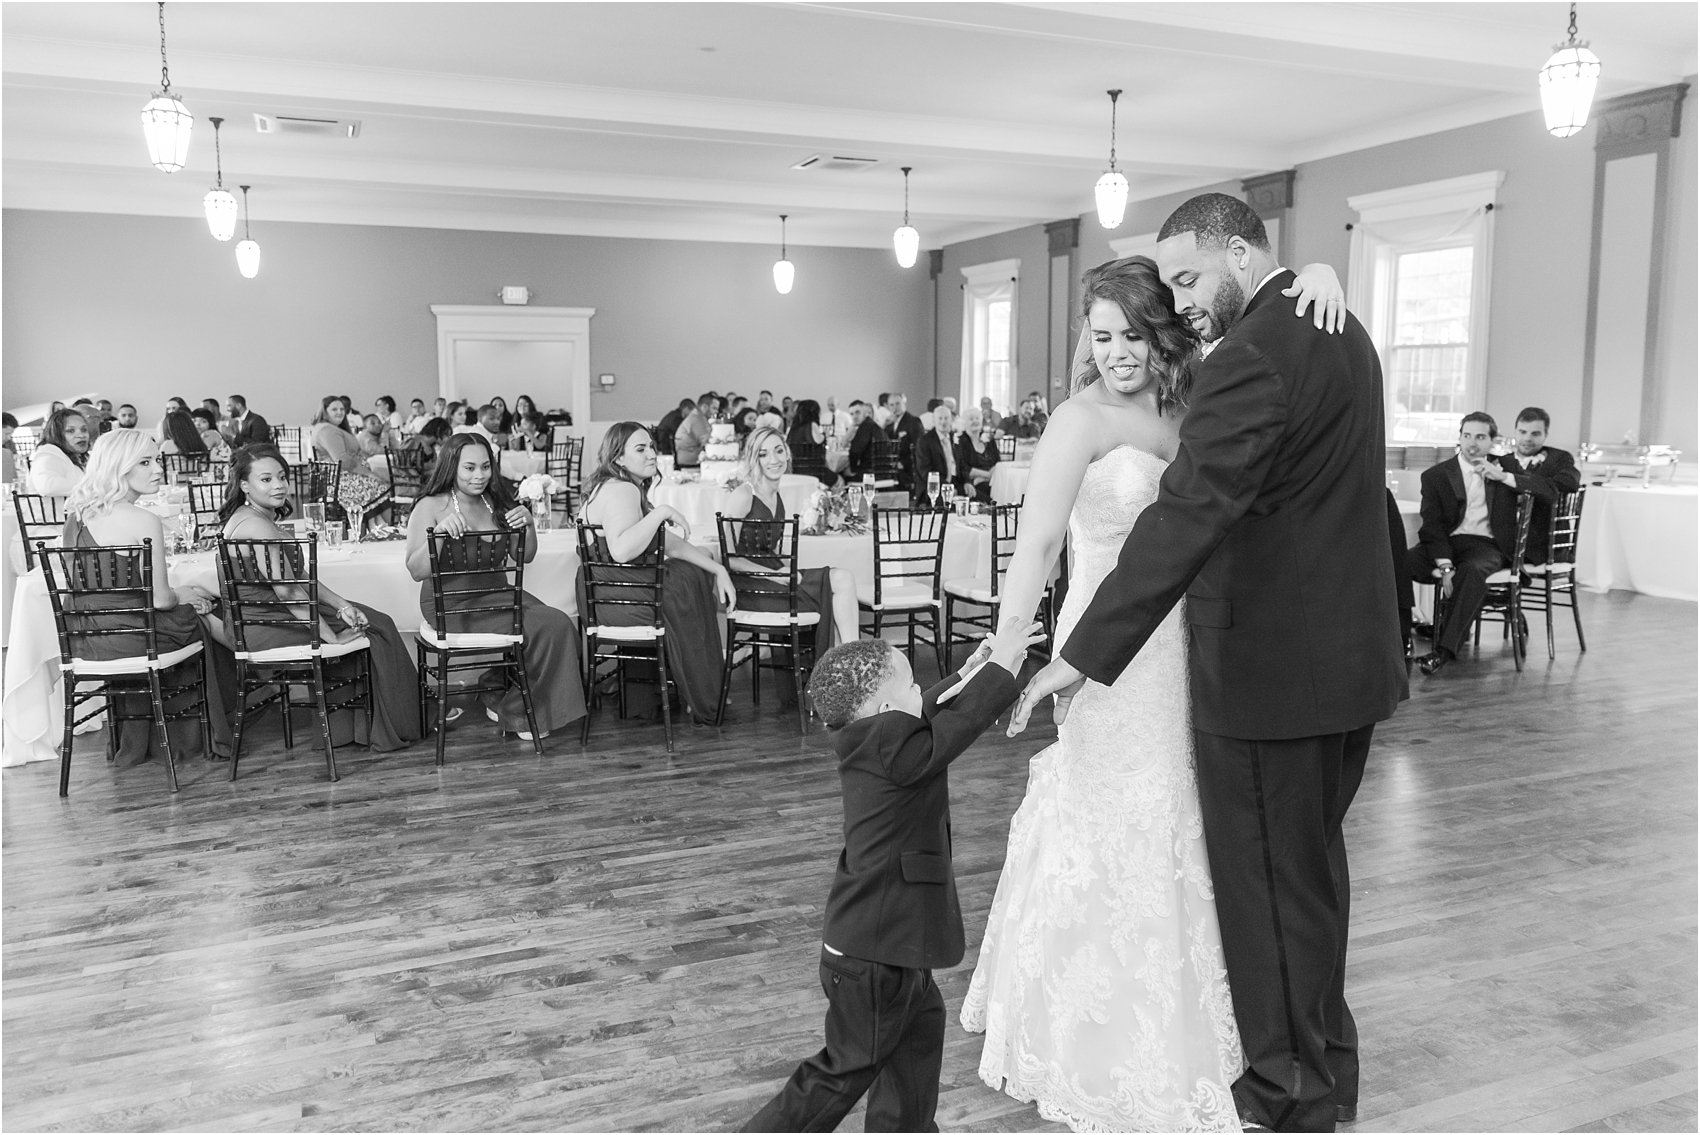 elegant-and-romantic-fall-wedding-photos-at-st-marys-catholic-church-in-monroe-michigan-by-courtney-carolyn-photography_0069.jpg